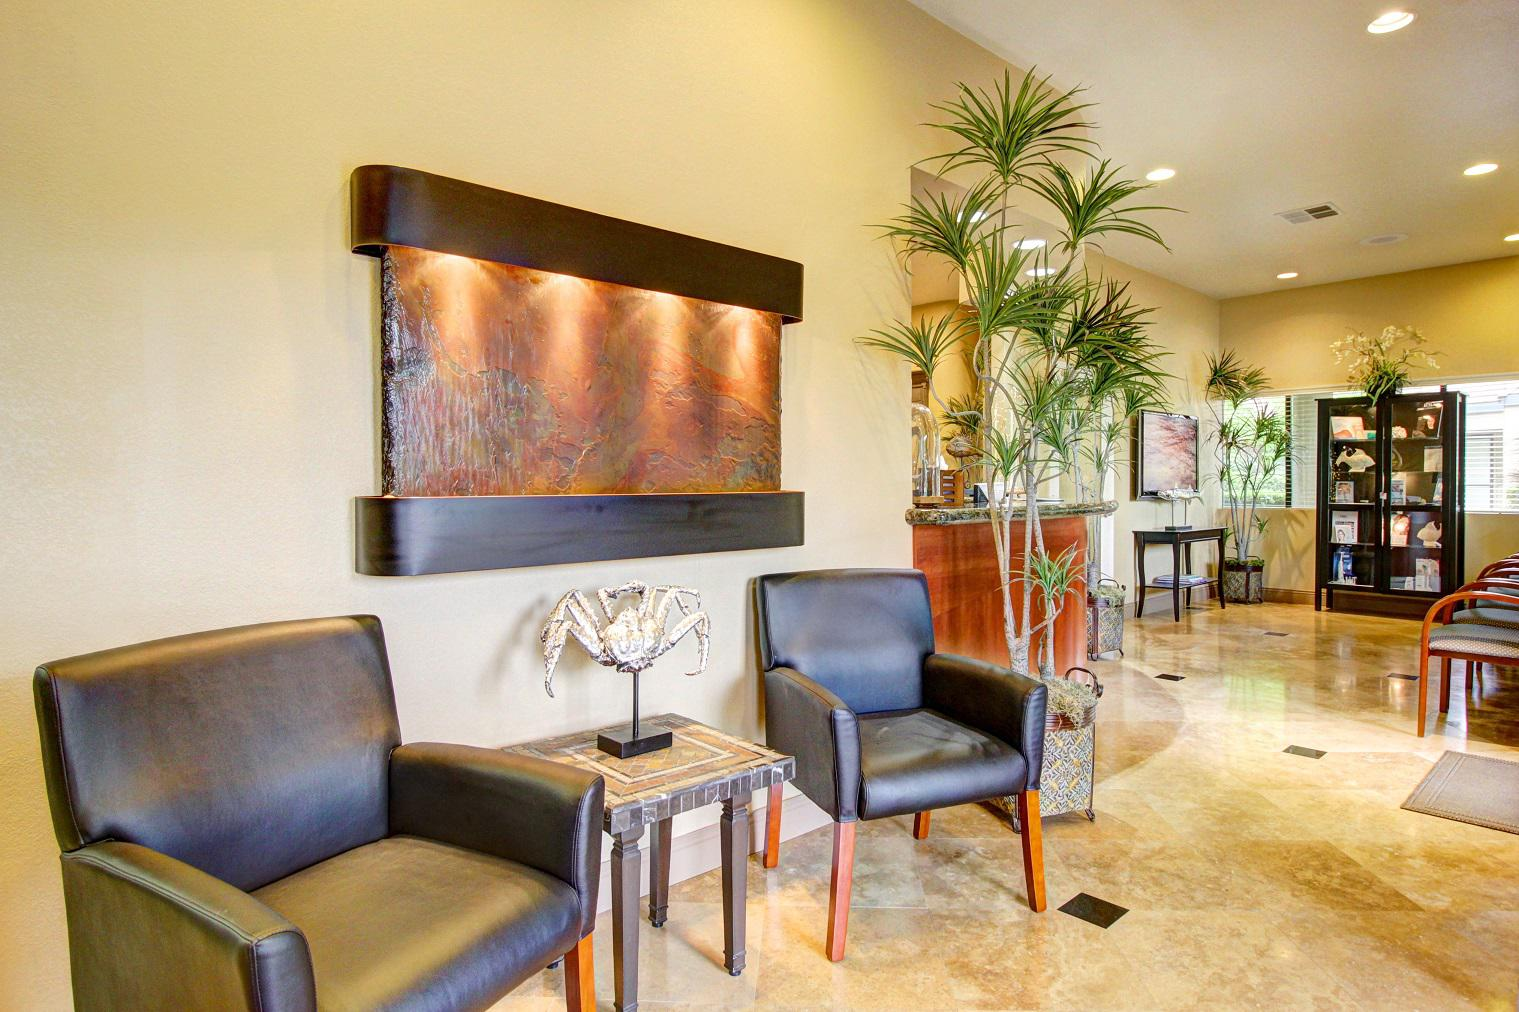 El Dorado Hills Cosmetic, Implant and Family Dentistry | 993 Governor Dr Ste 104, El Dorado Hills, CA, 95762 | +1 (916) 941-1515